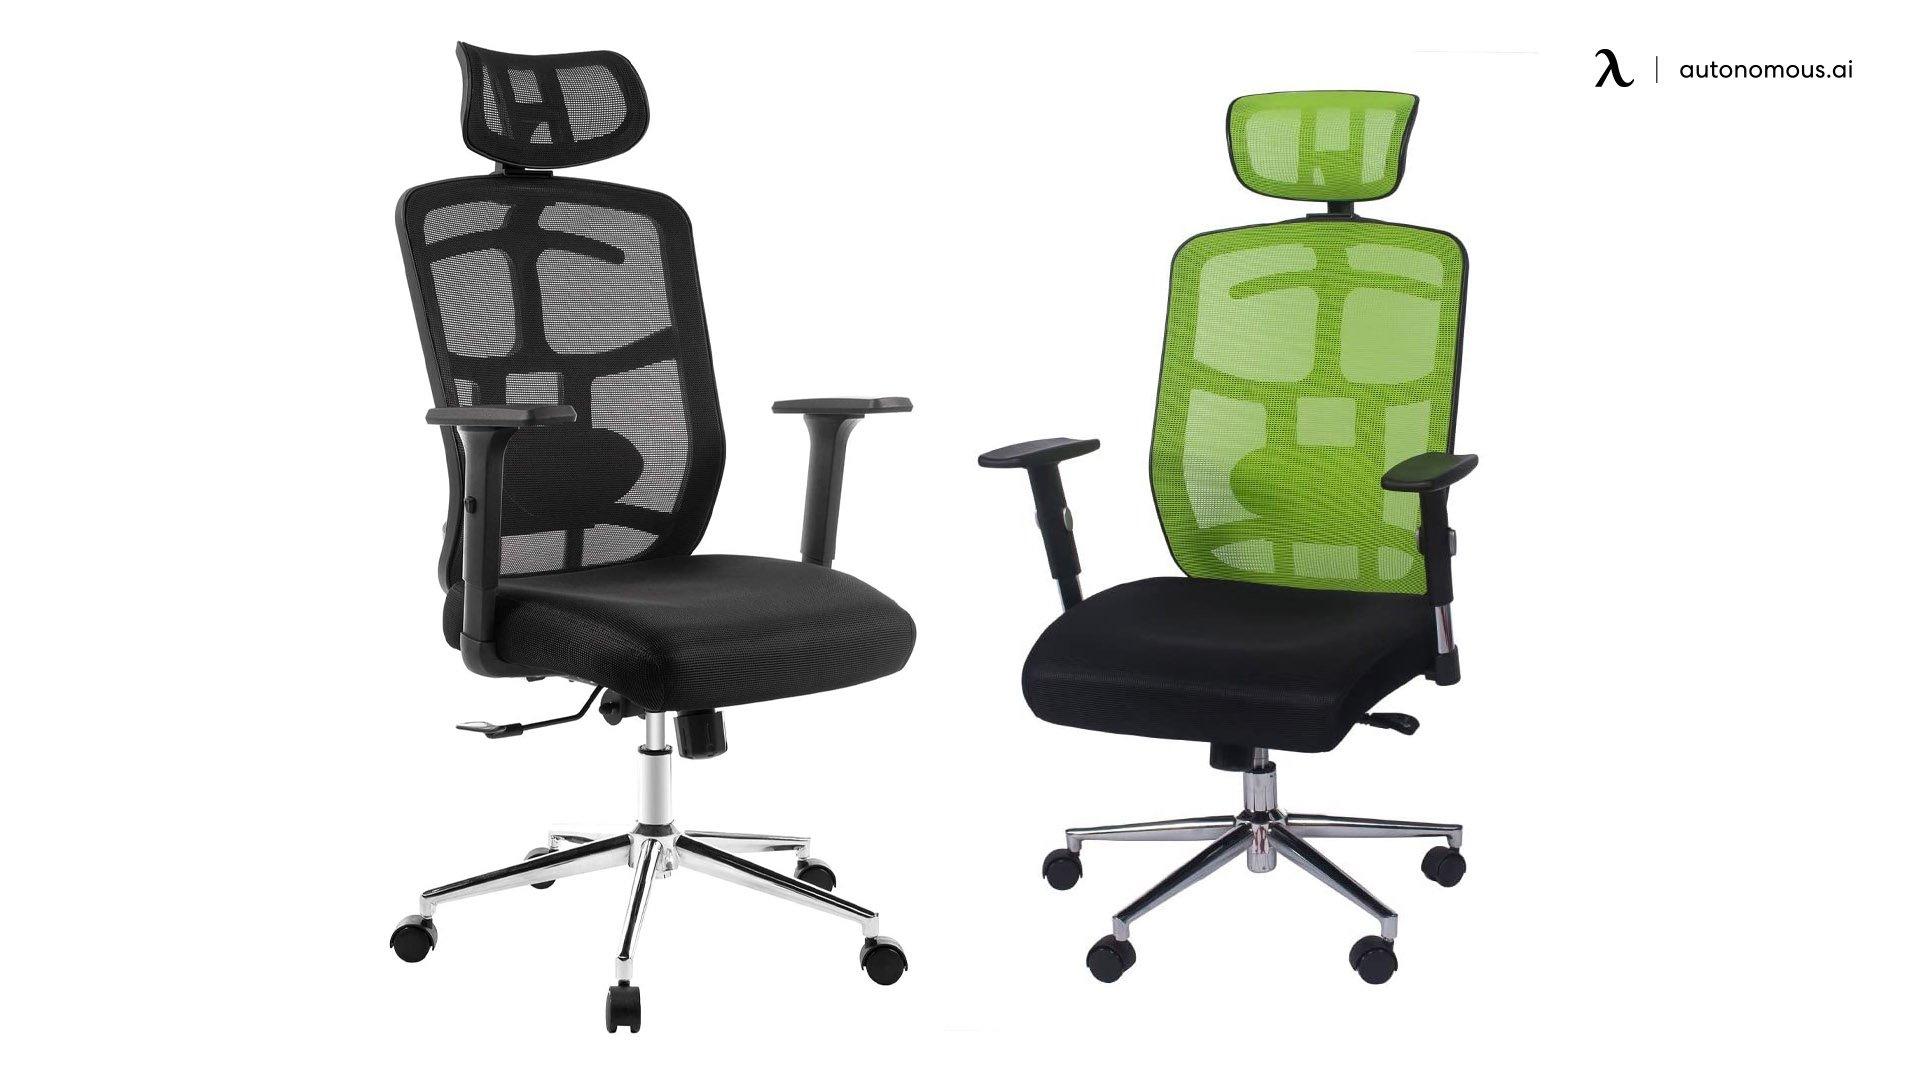 TOPSKY Mesh Ergonomic Chair